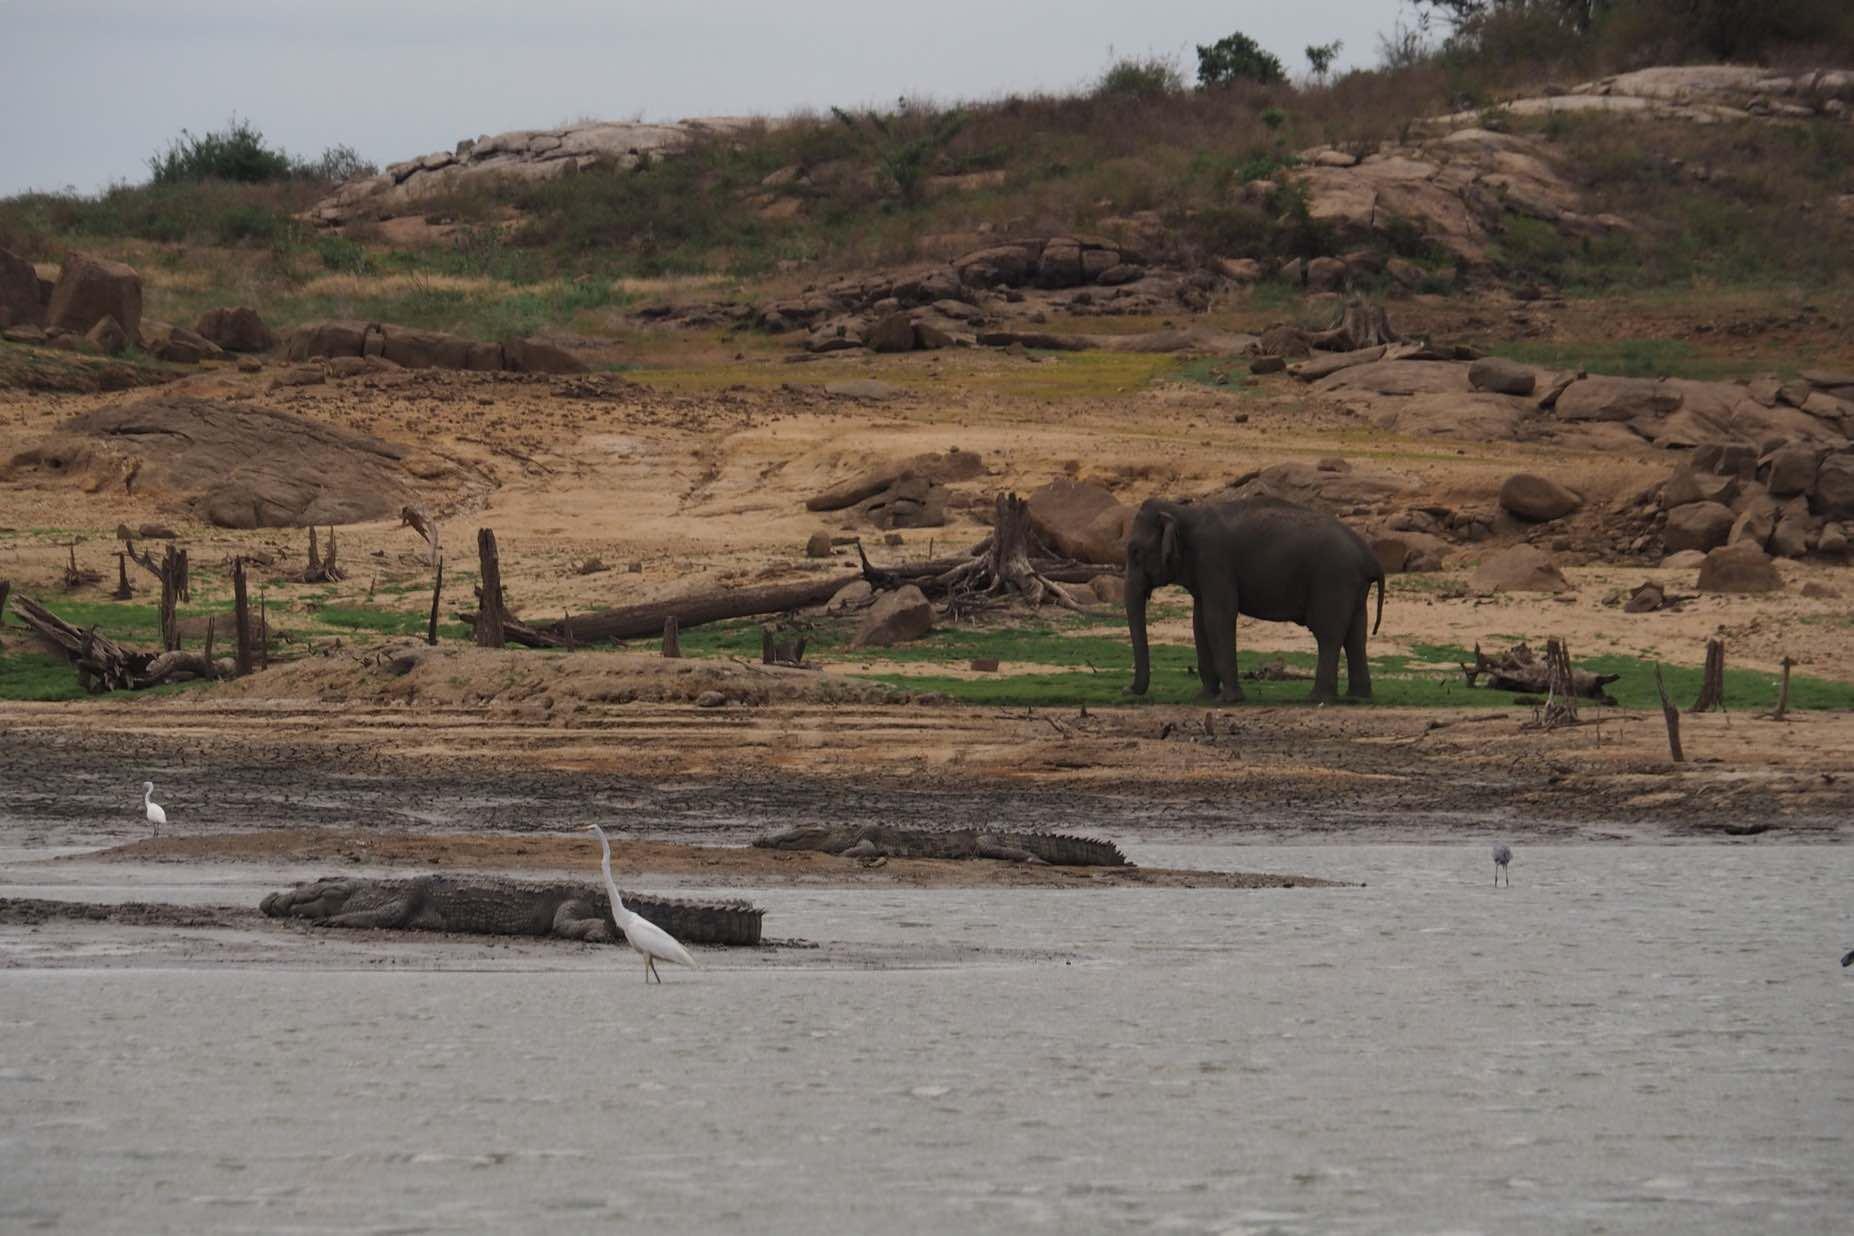 sri-lanka-gal-oya-boat-safari-holiday-review-feedback-invite-to-paradise-quentin-kate-hulm.jpg